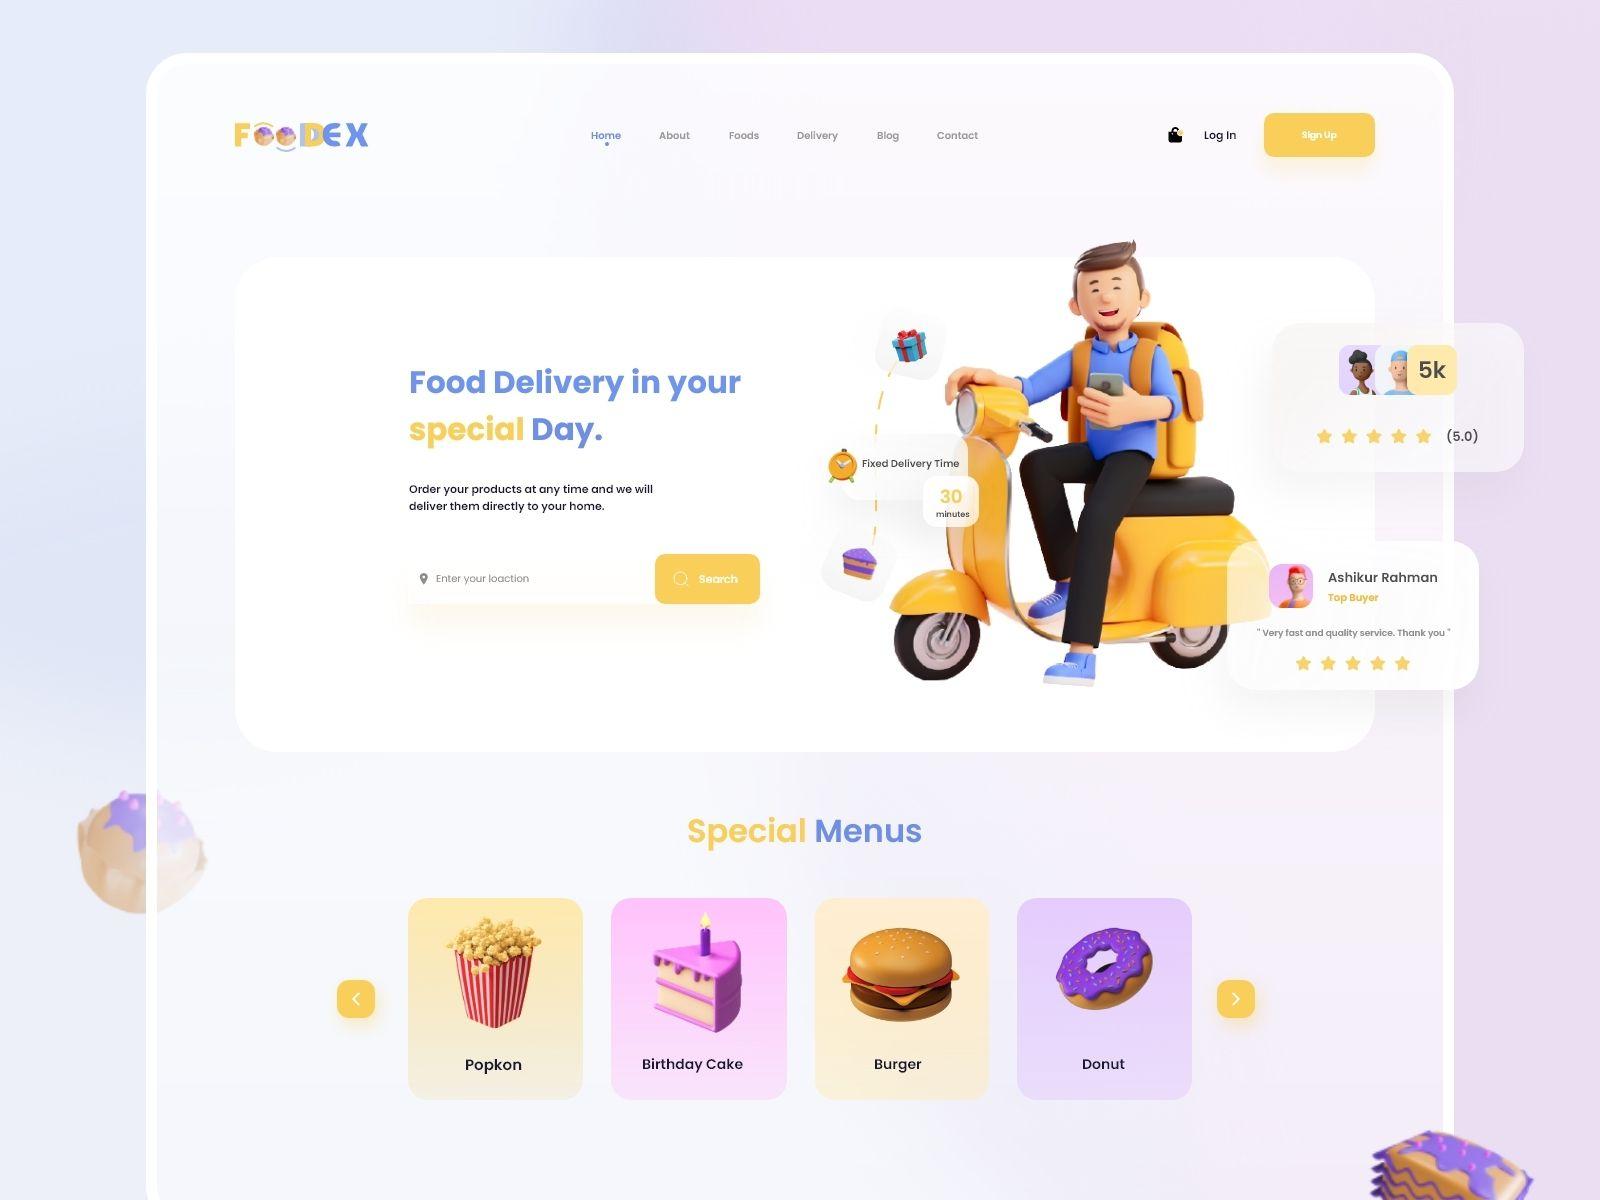 Web design inspiration: by Ashikur Rahman